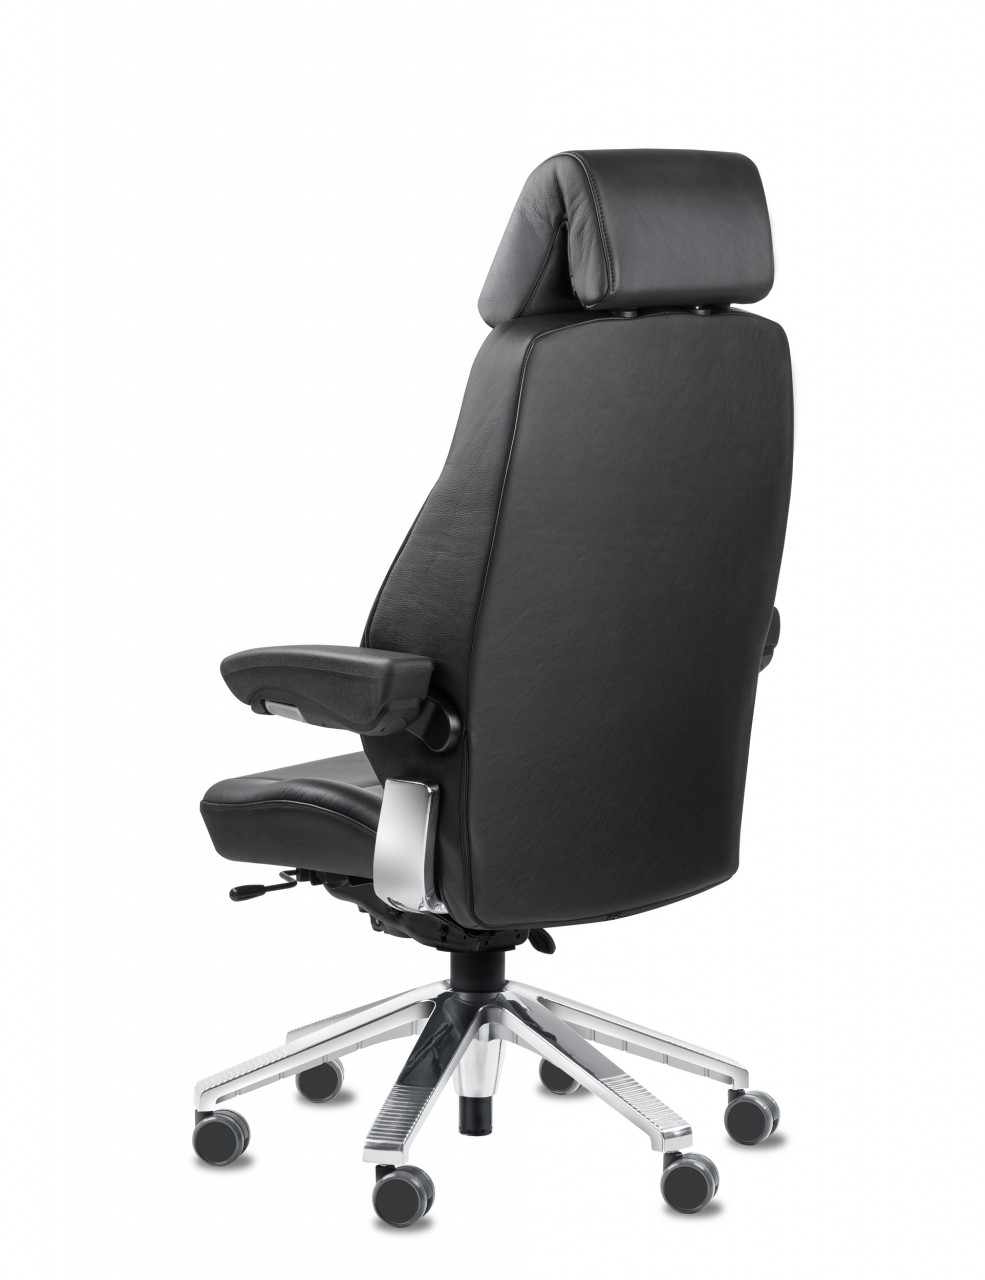 fauteuil 24 heures s5 achat fauteuils 24 heures 1 988 00. Black Bedroom Furniture Sets. Home Design Ideas